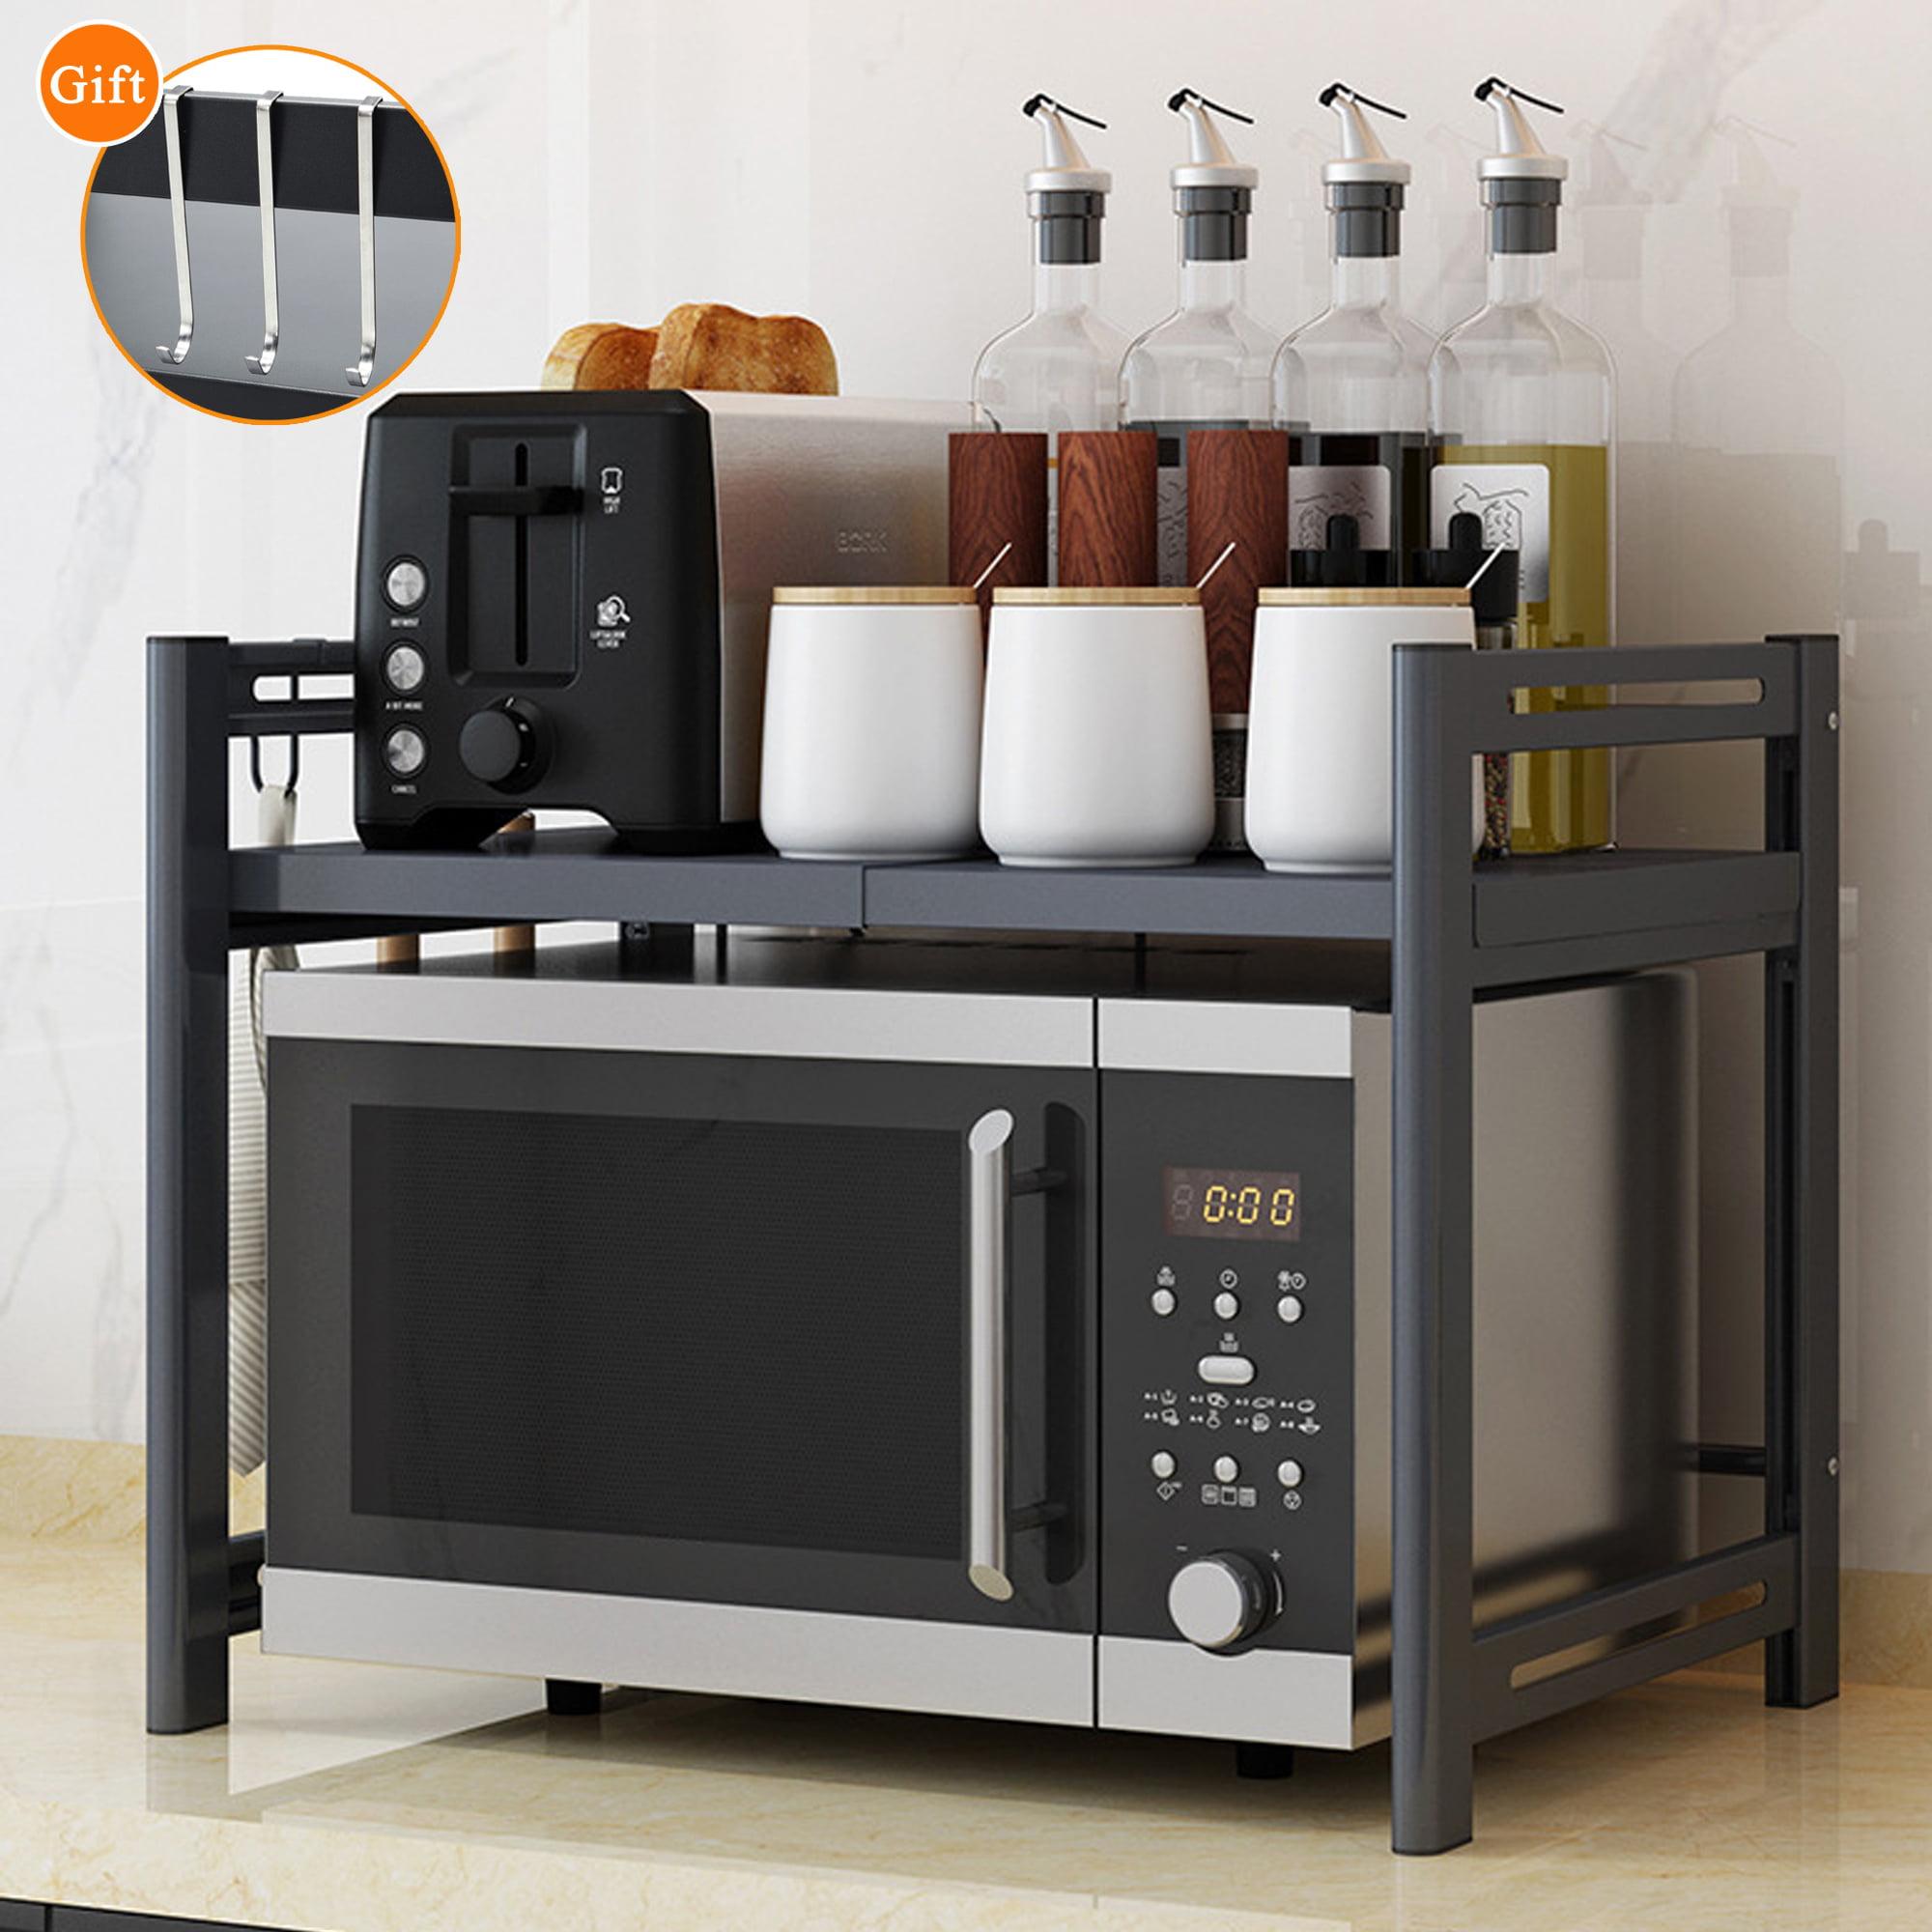 2 Tier Organizer Microwave Kitchen Storage Shelf Rack Stand Bracket With 6 Hooks